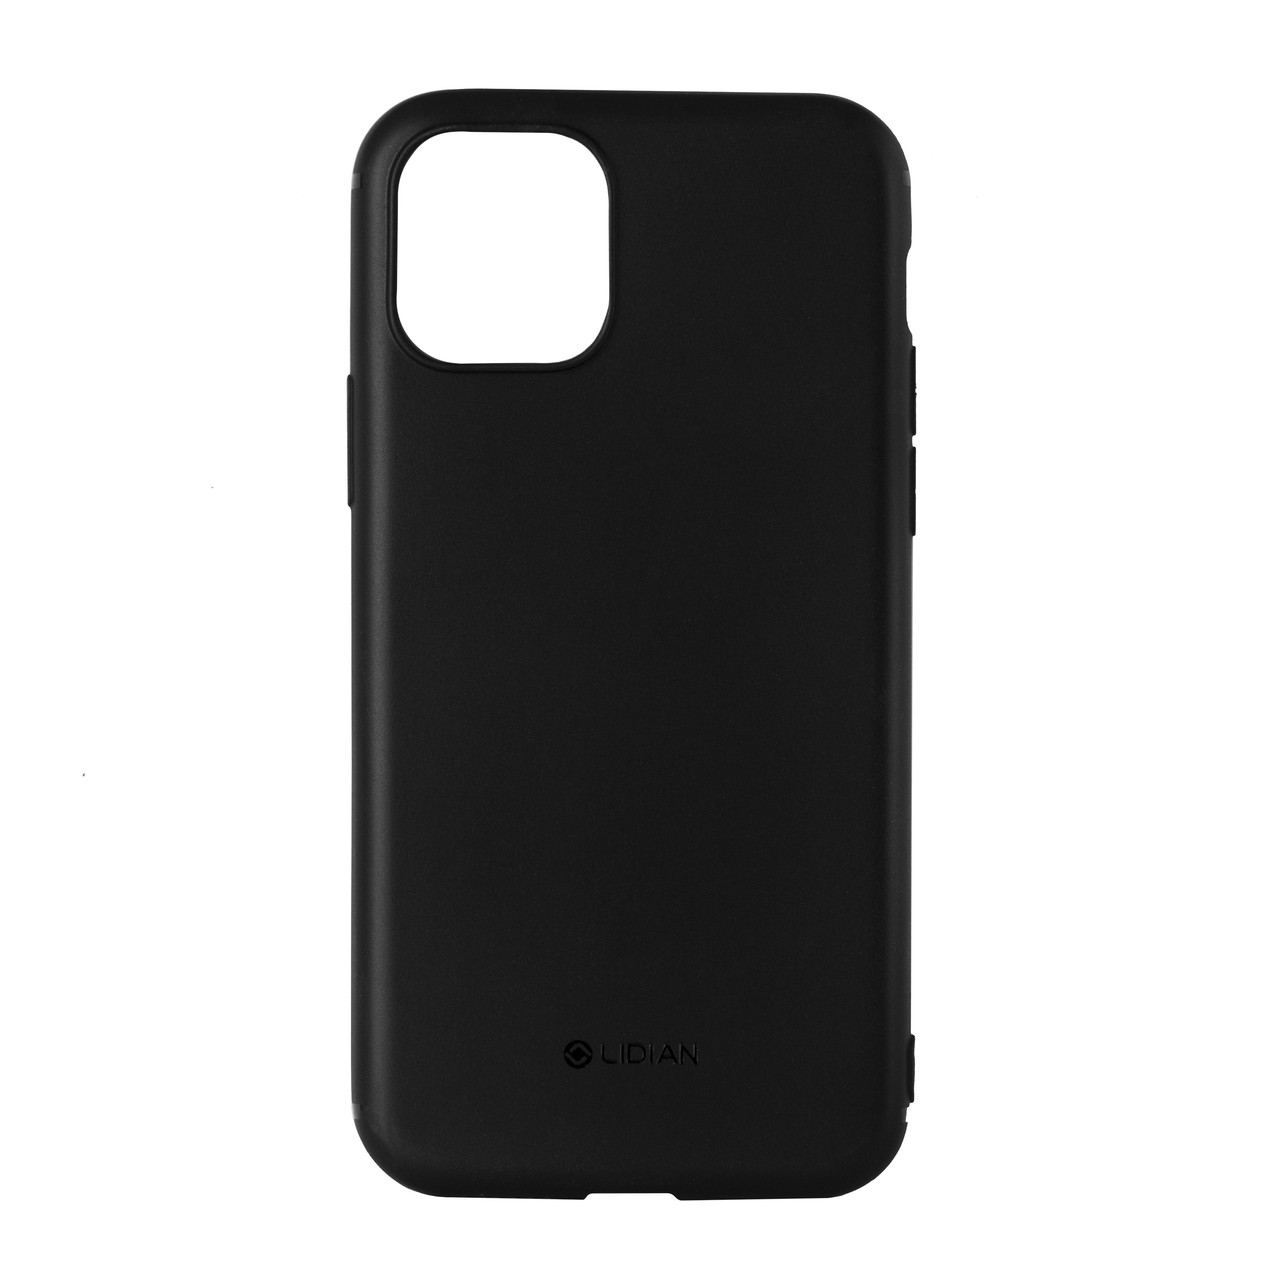 Чехол для Apple iPhone 11 Pro Max (6.5*) back cover gel Lidian Thin Silicone Soft Black